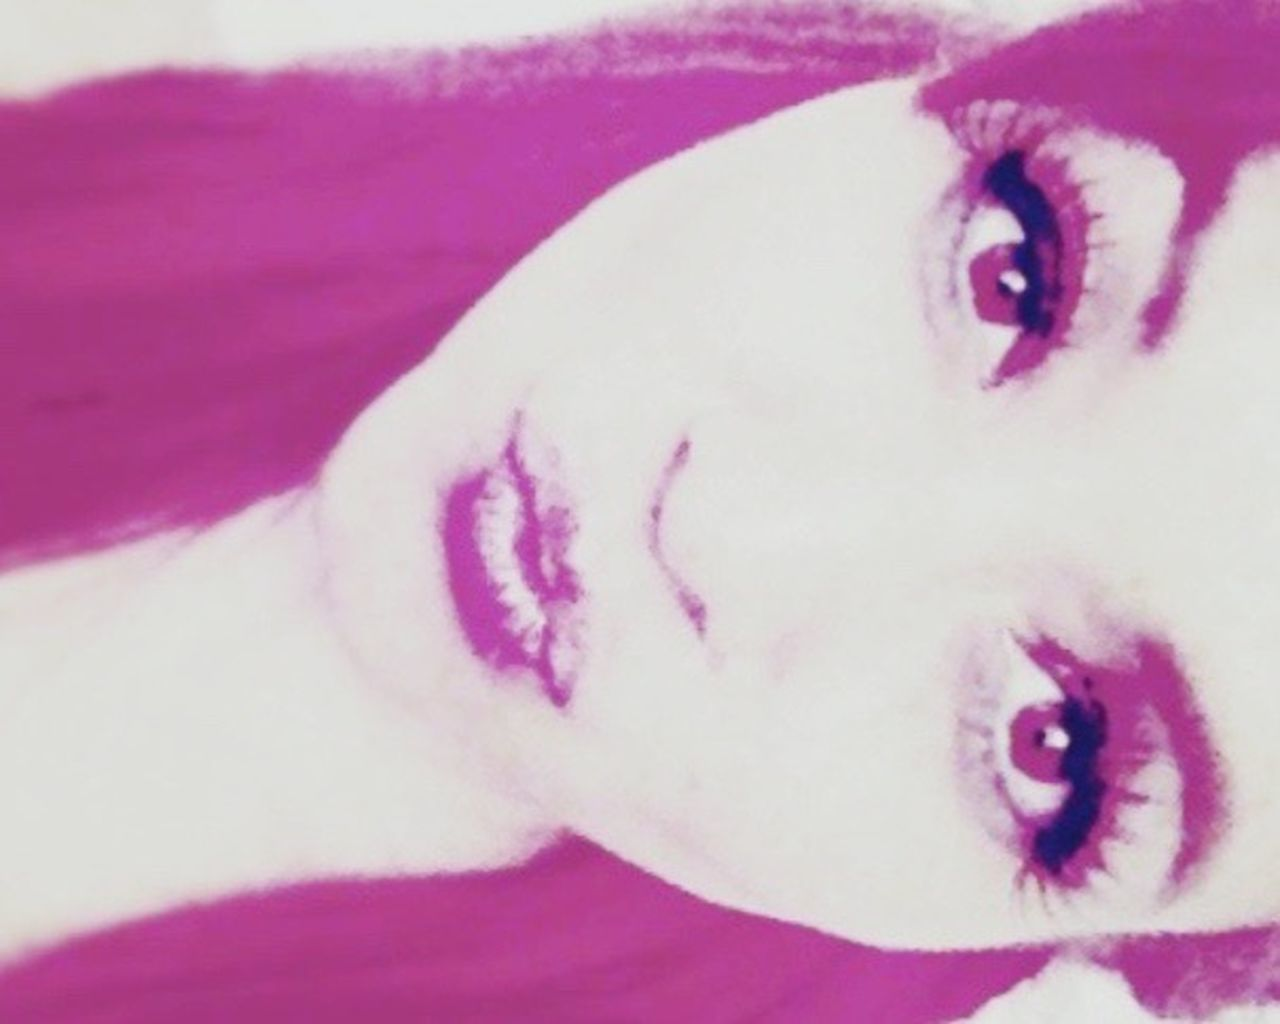 Peka Cure Beautiful Crazyness Rules Red Lips Cherry Kisses Bigbrowneyes Lifestyles Close-up Eyemface Headshot Beautiful People